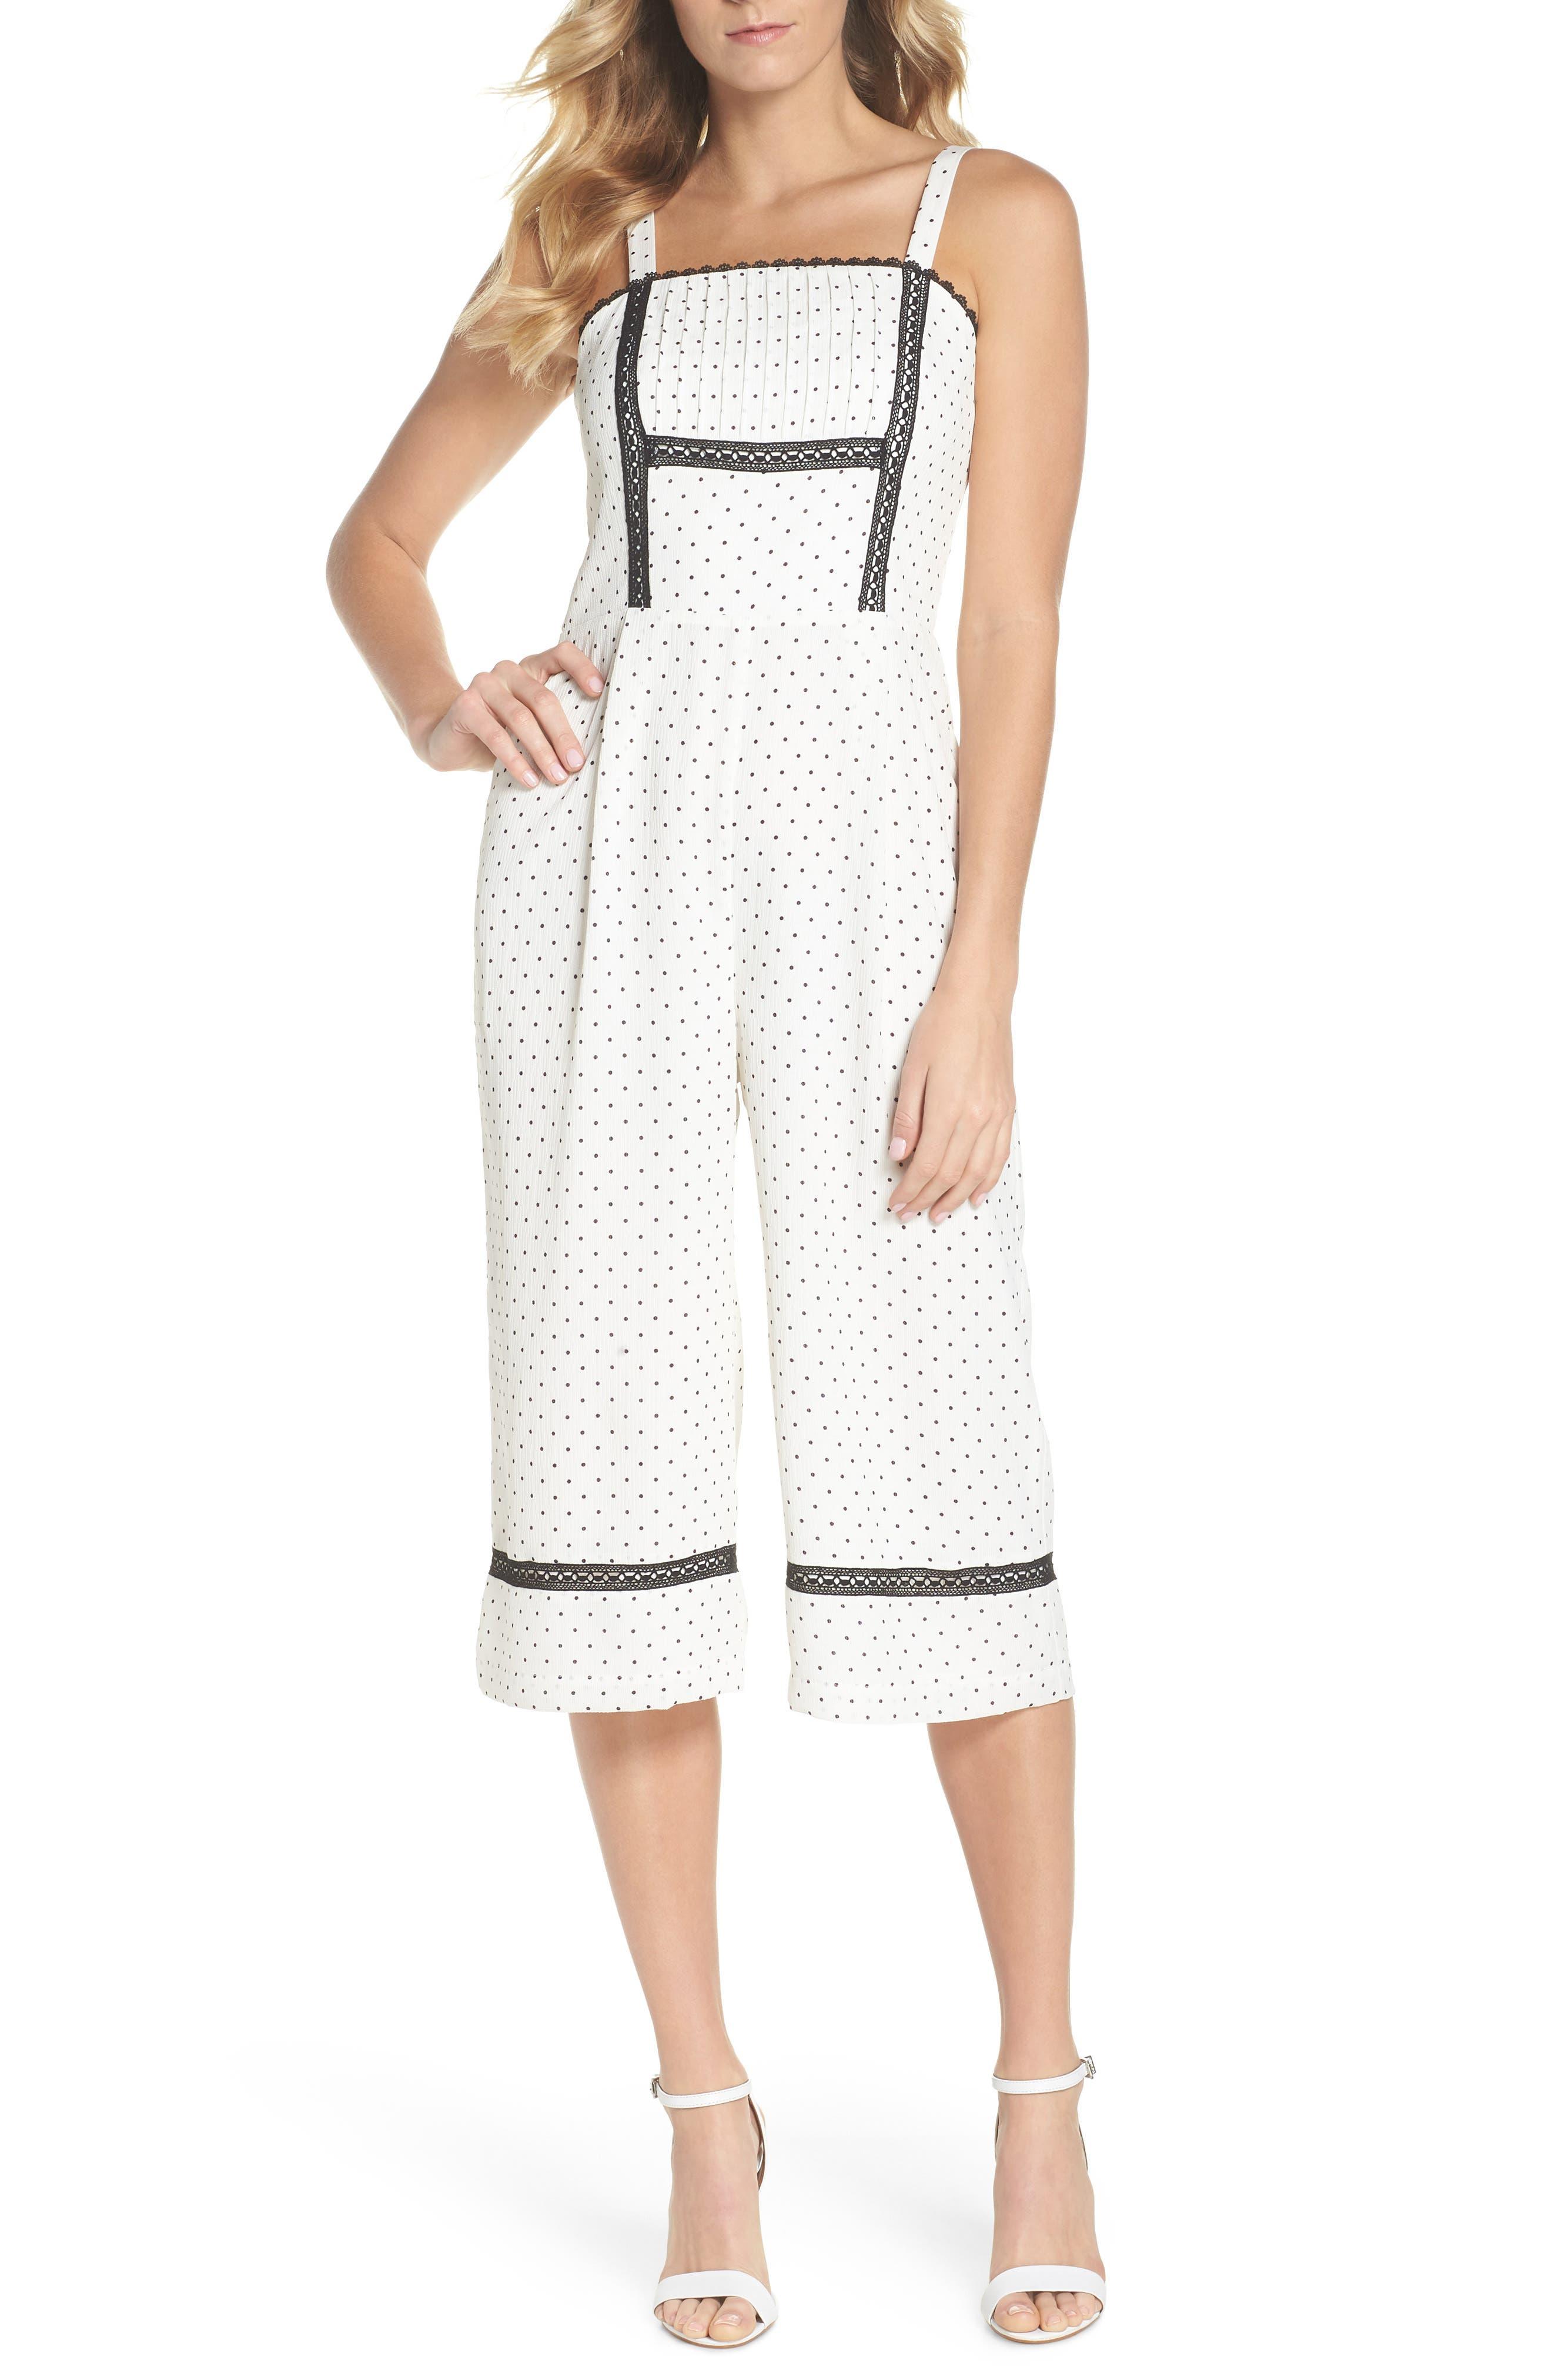 Nadine Polka Dot Culotte Jumpsuit,                             Main thumbnail 1, color,                             White/ Black